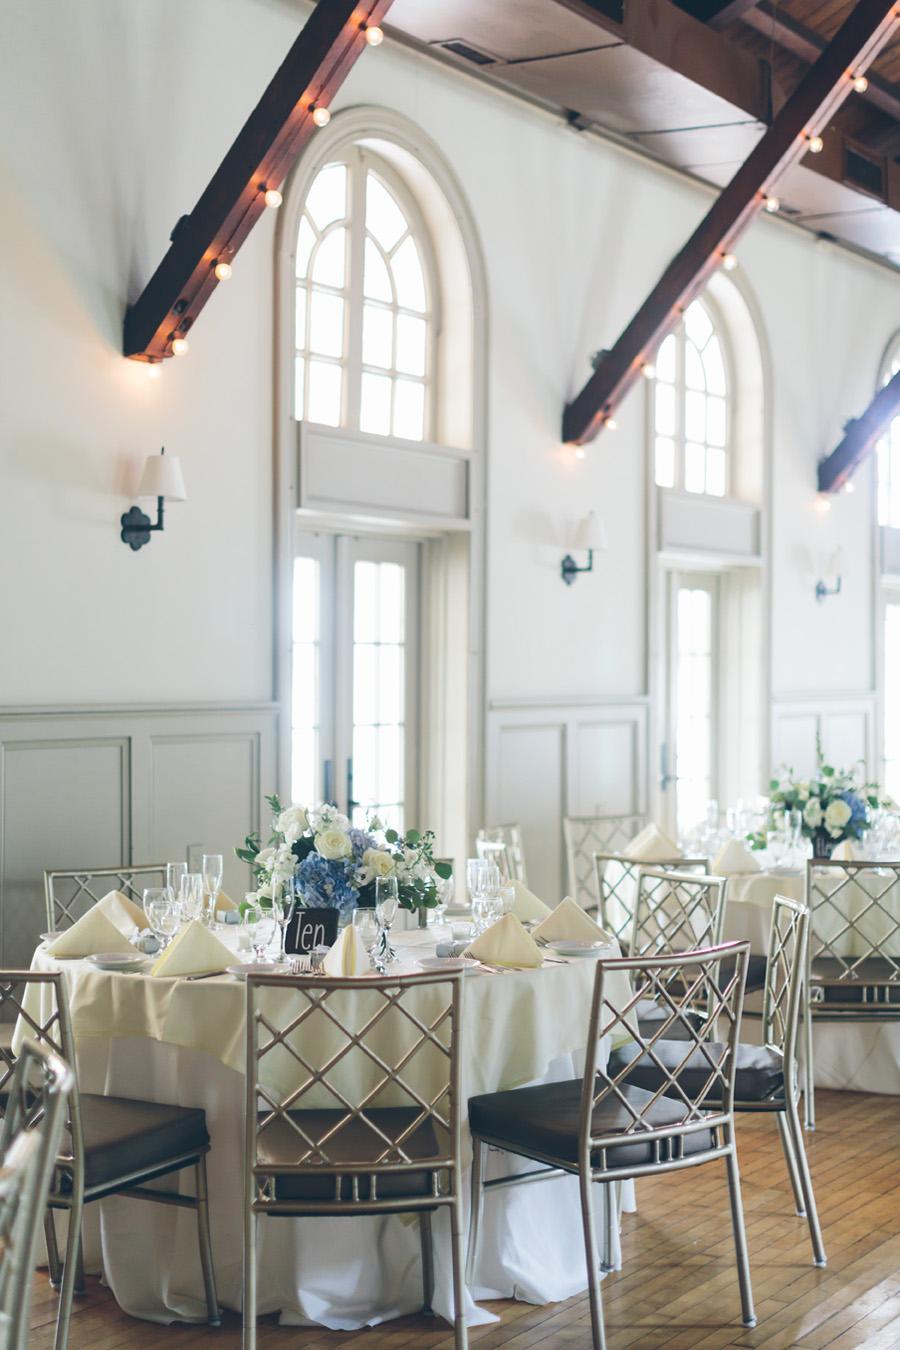 VICTORIA-BRIAN-NY-WEDDING-DETAILS-CYNTHIACHUNG-0091.jpg